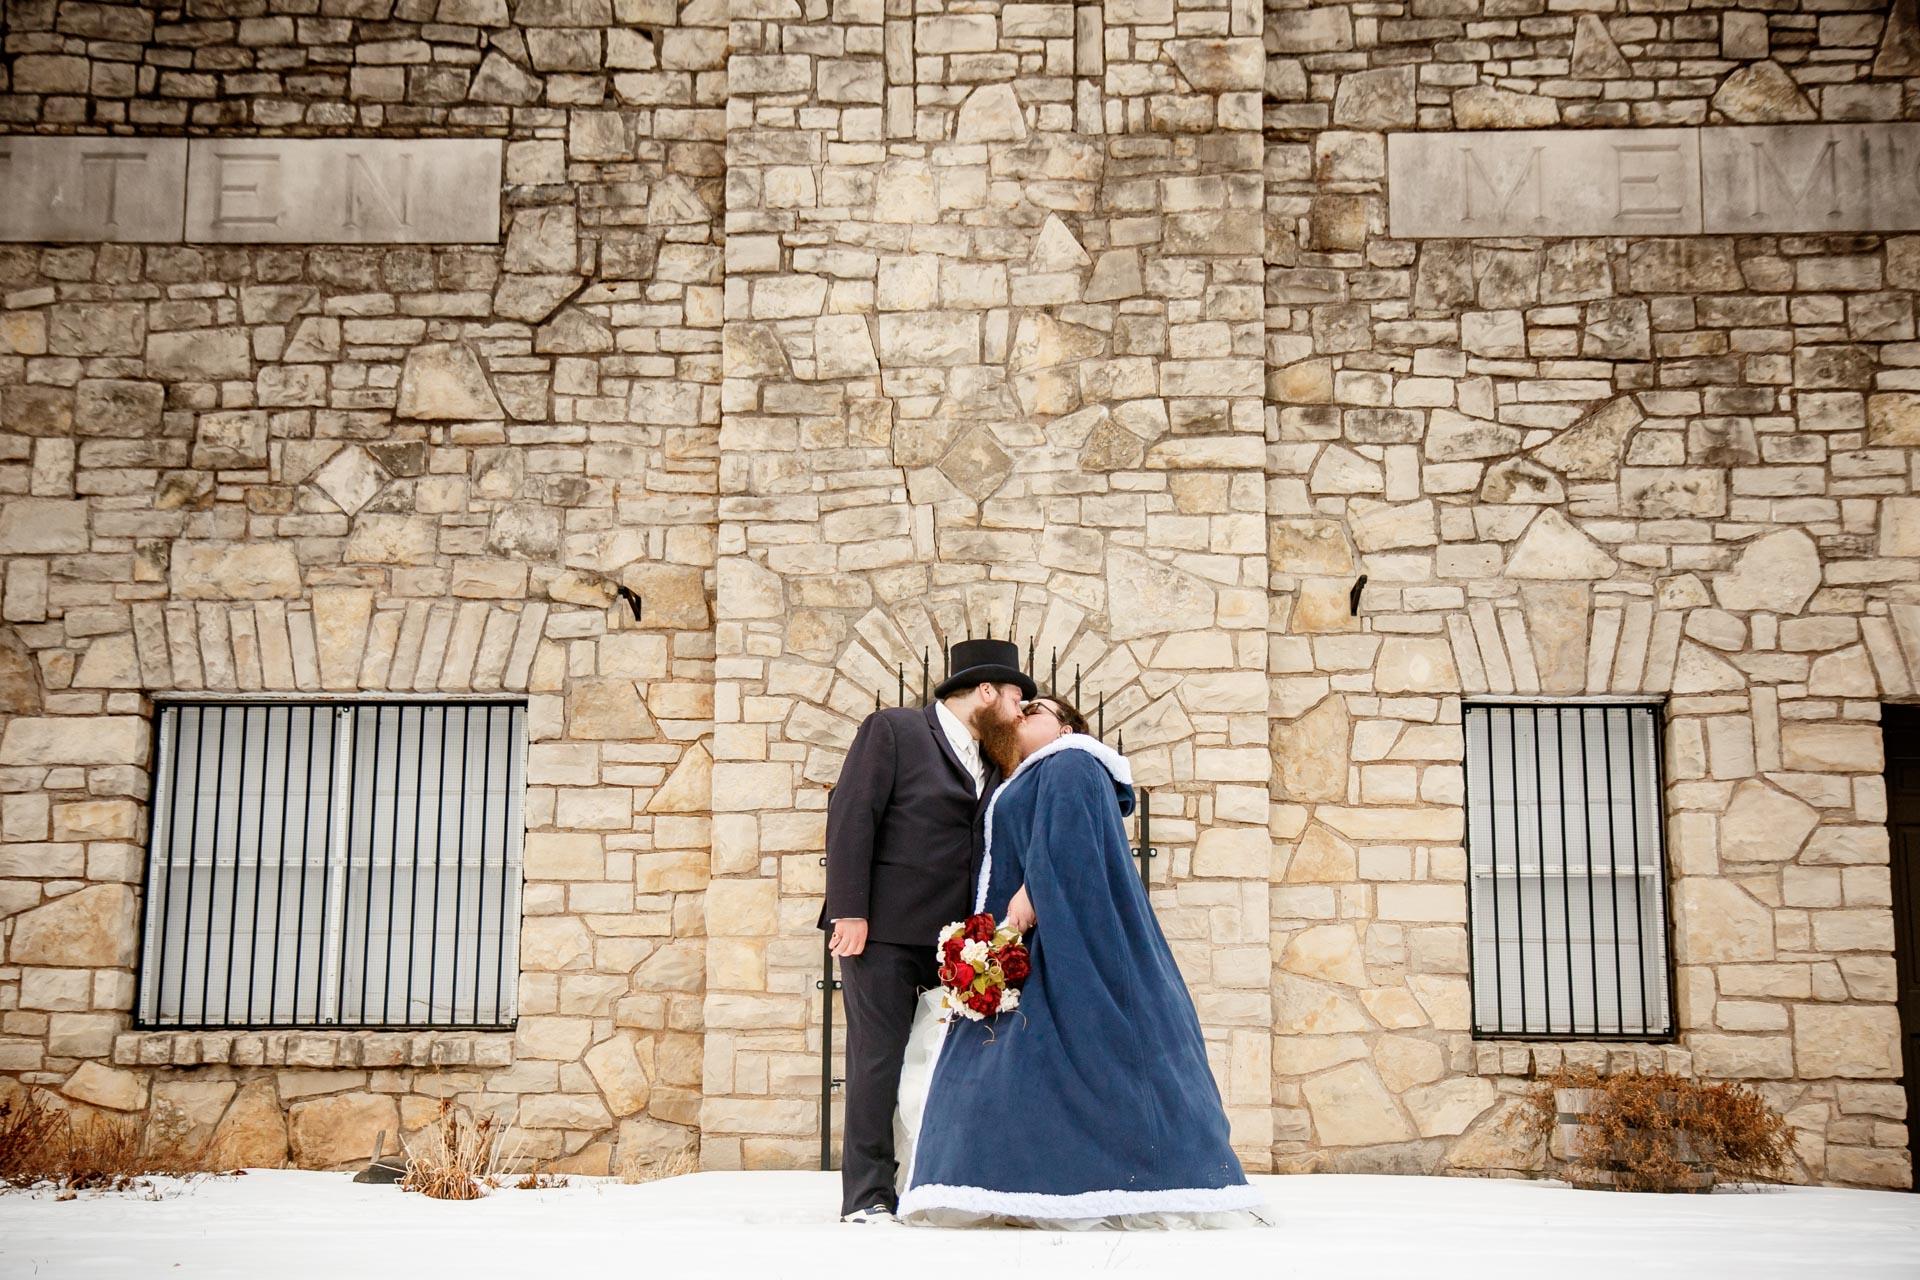 wedding-adam-shea-photography-green-bay-appleton-neenah-photographer-05.jpg